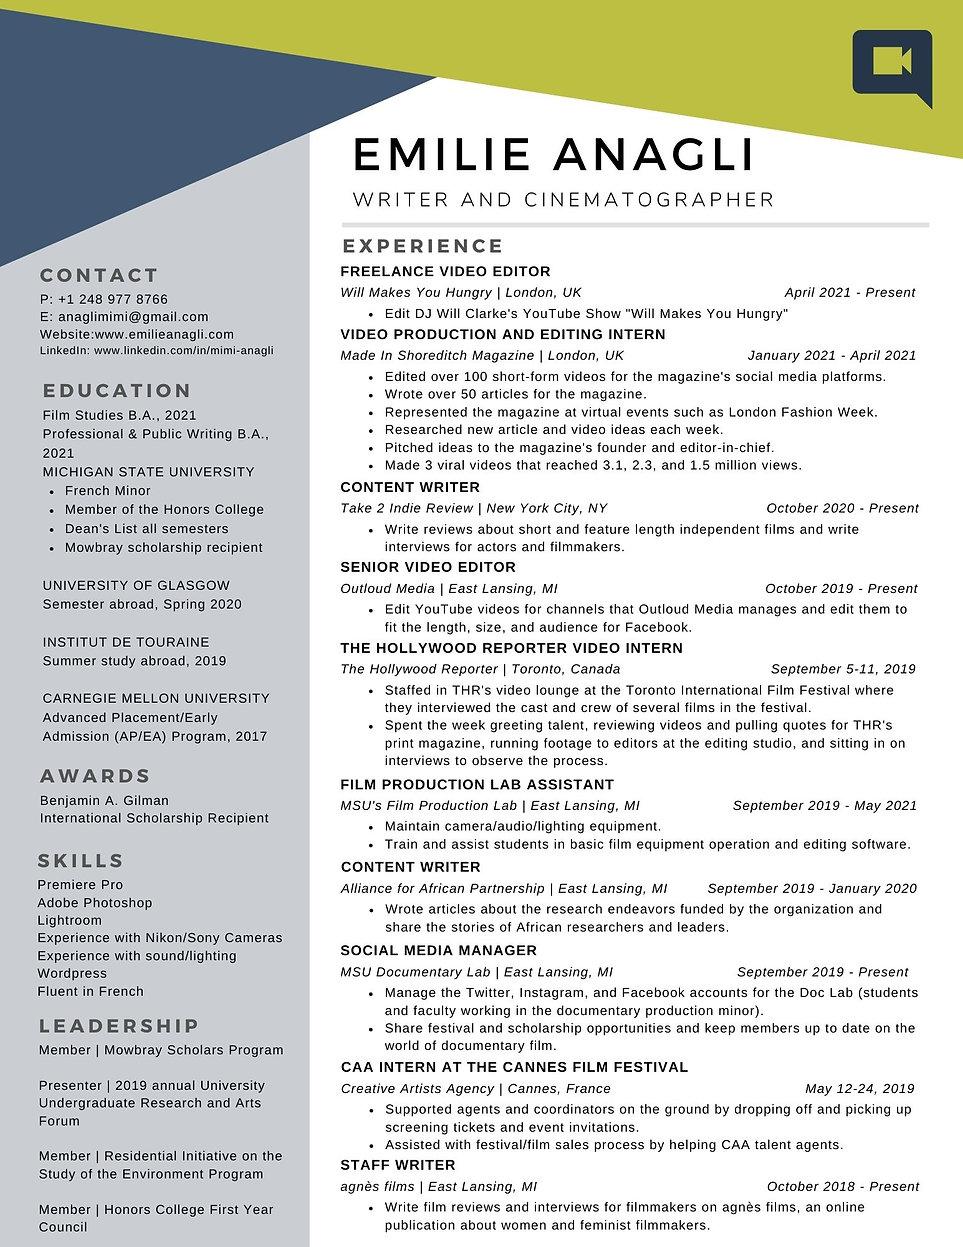 Emilie Anagli Resume.jpg